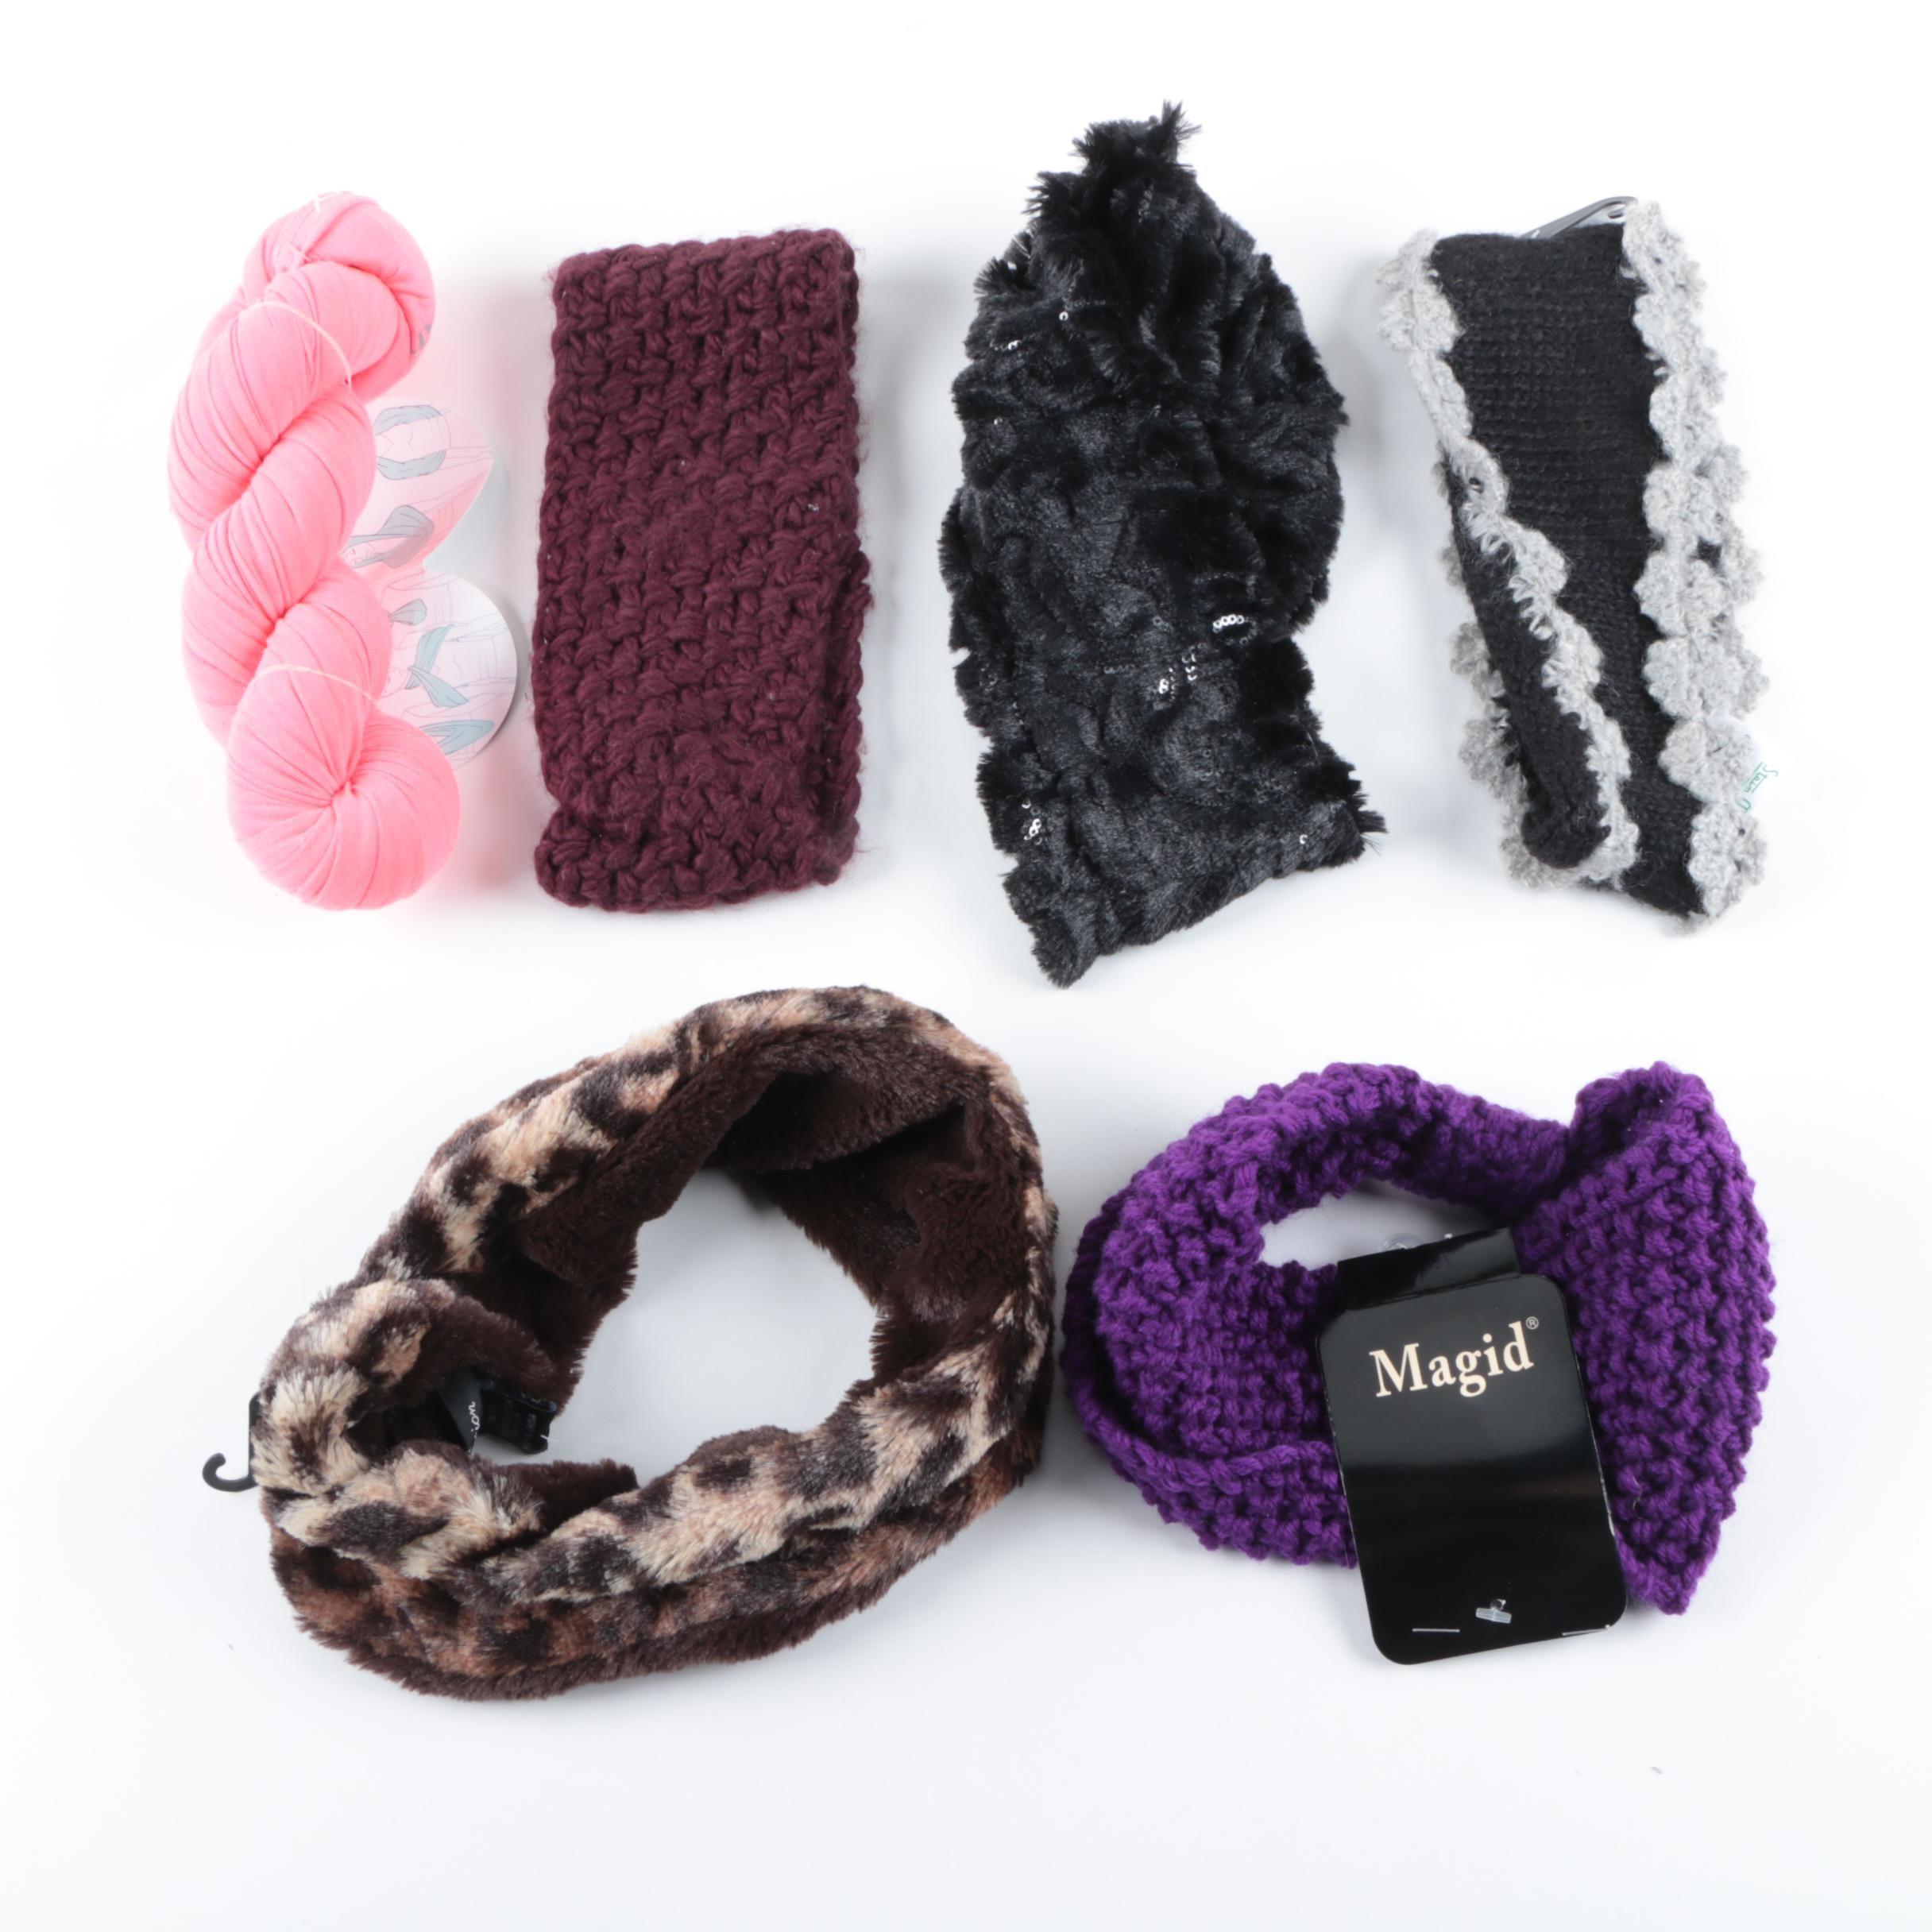 Apana Patanjali Scarf and Headbands